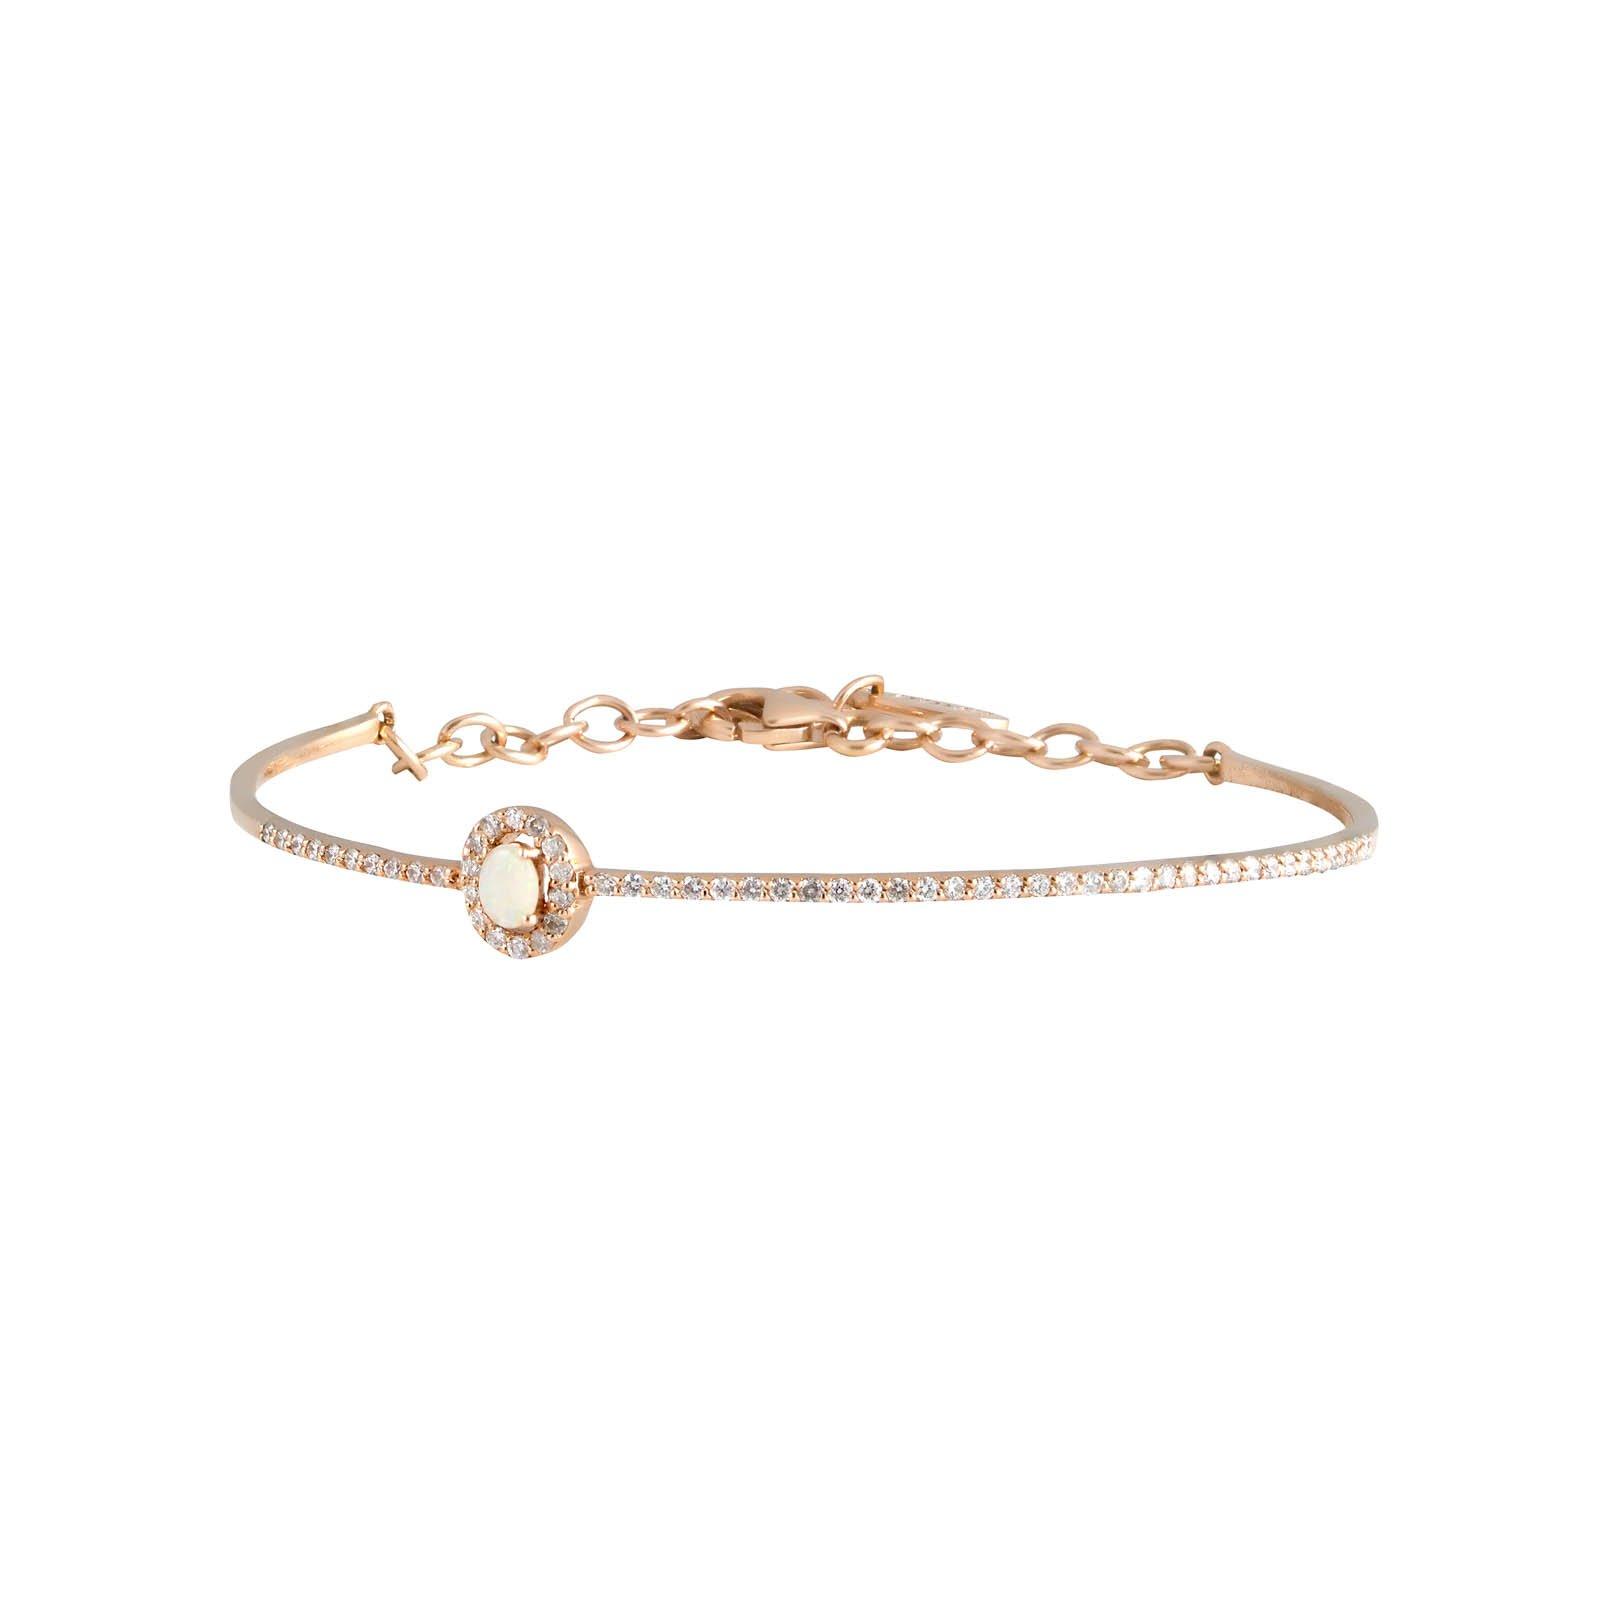 Daou Jewellery 18kt Gold, Ruby & Diamond Orbit Bangle